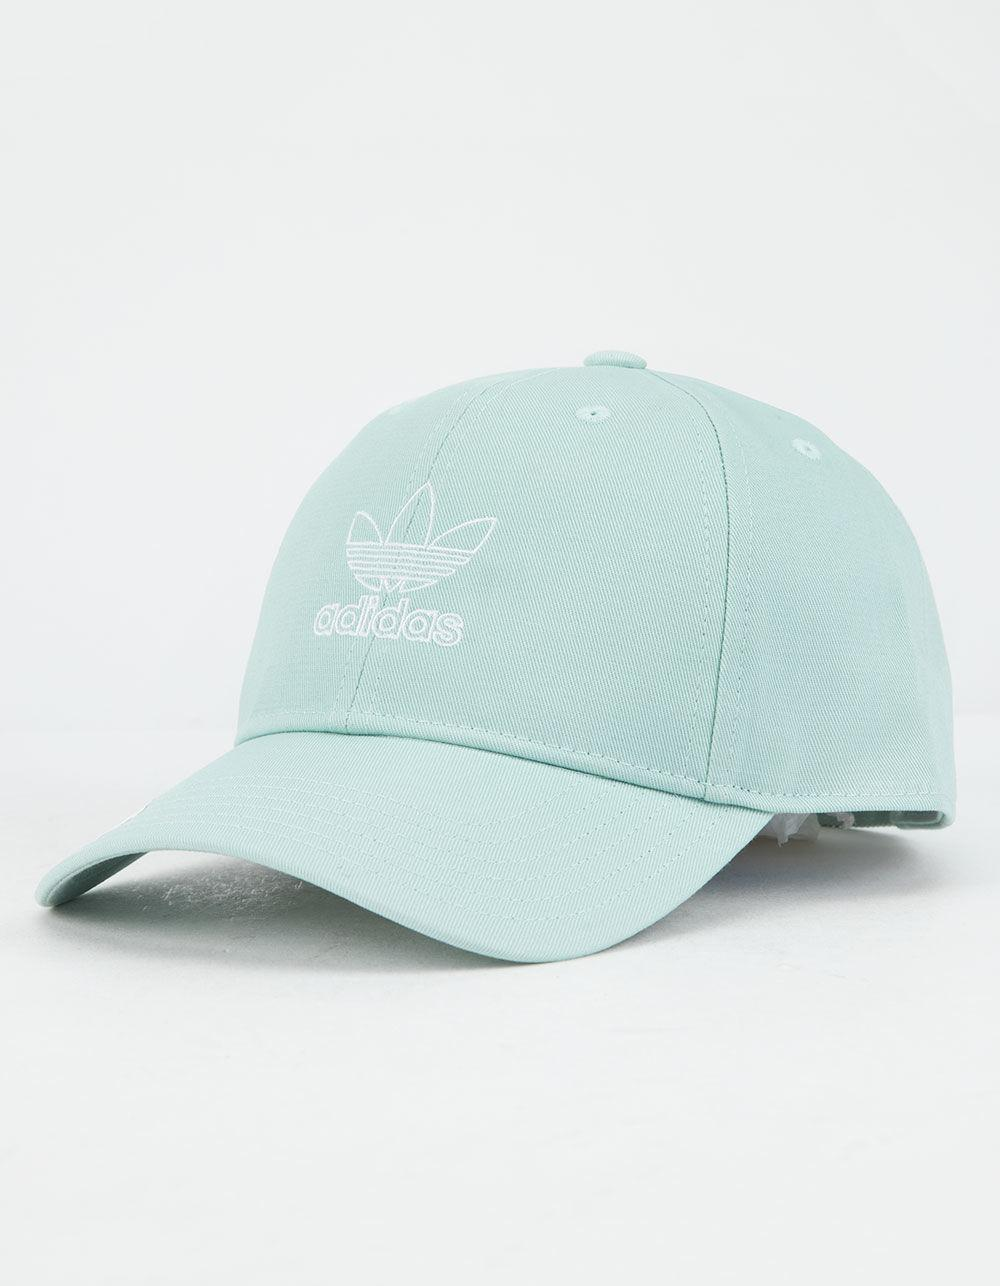 d7a9004684b Adidas - Originals Relaxed Outline Ash Green Womens Strapback Hat - Lyst.  View fullscreen